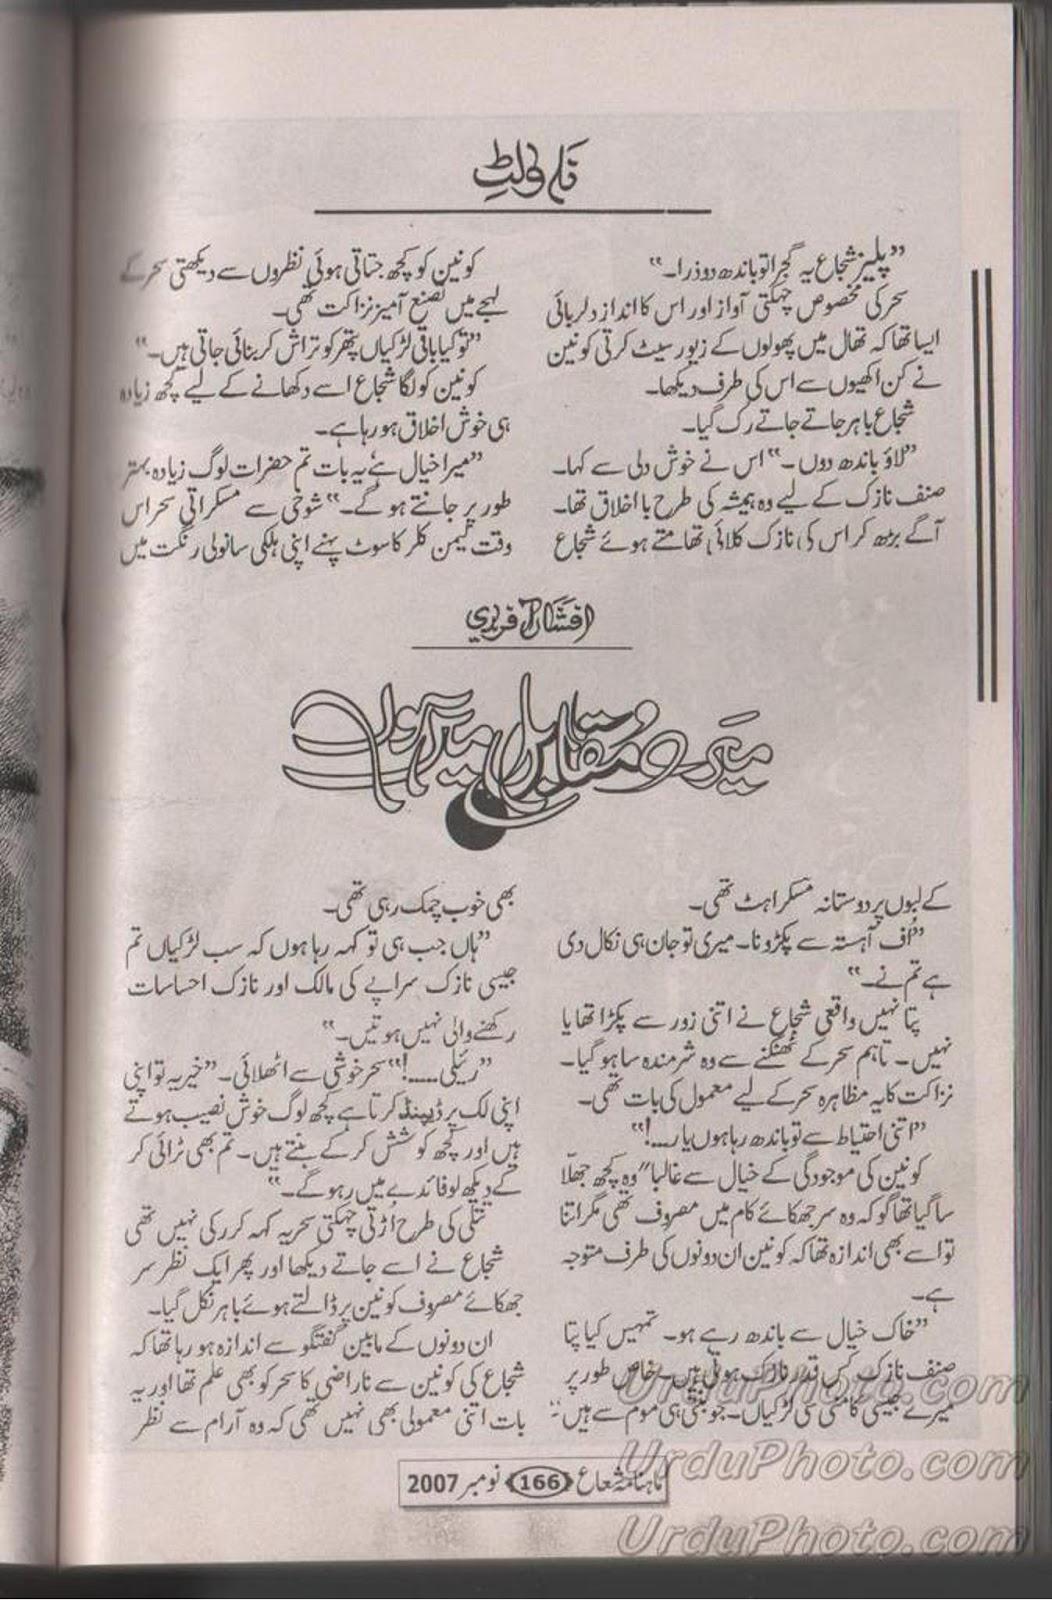 Manavi hakka essay writer